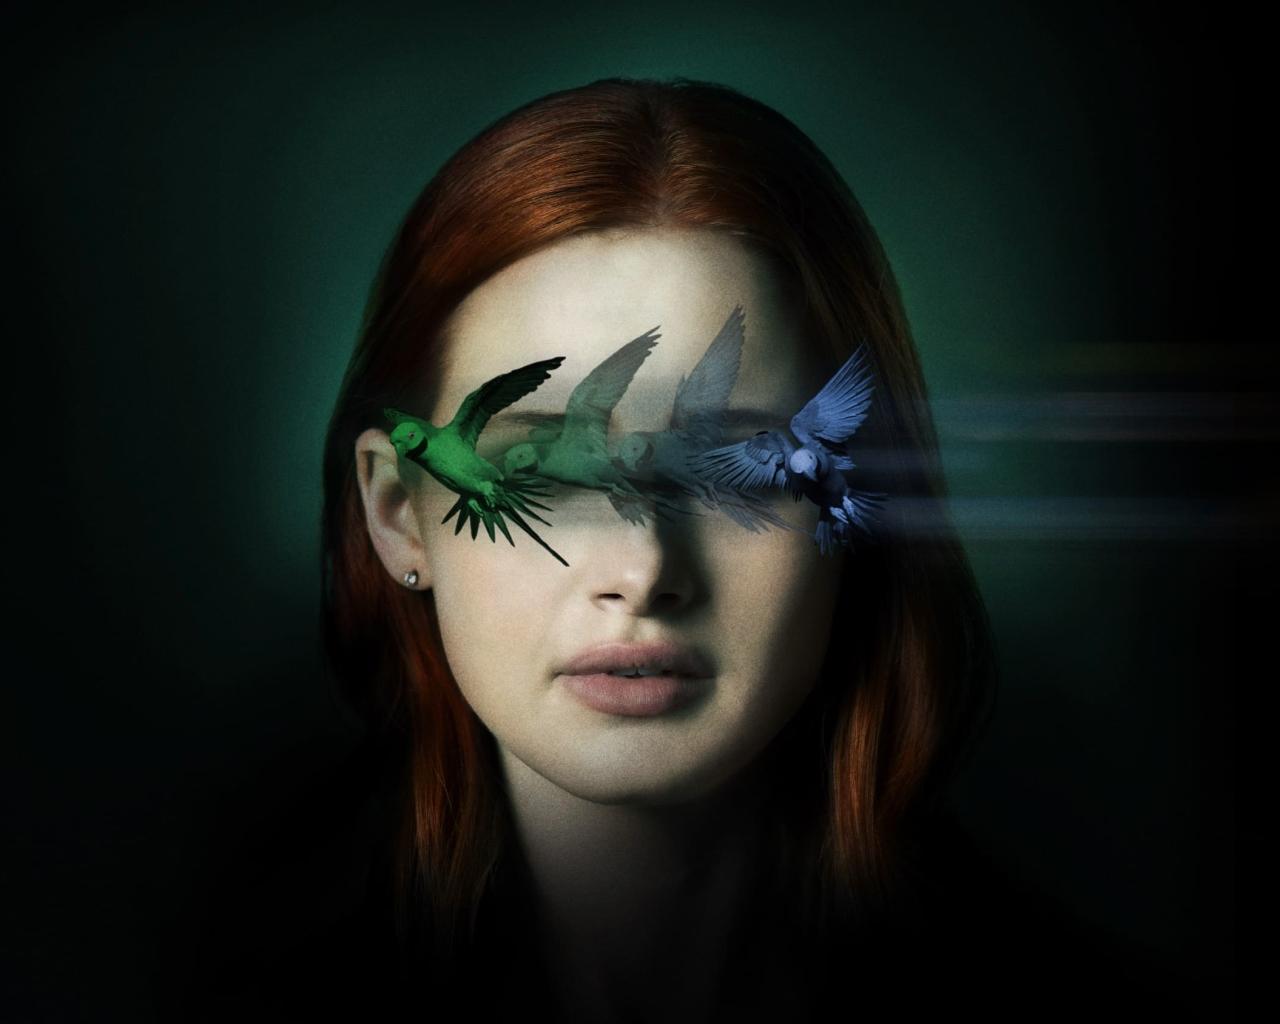 Madelaine Petsch Sightless Movie Wallpaper in 1280x1024 Resolution